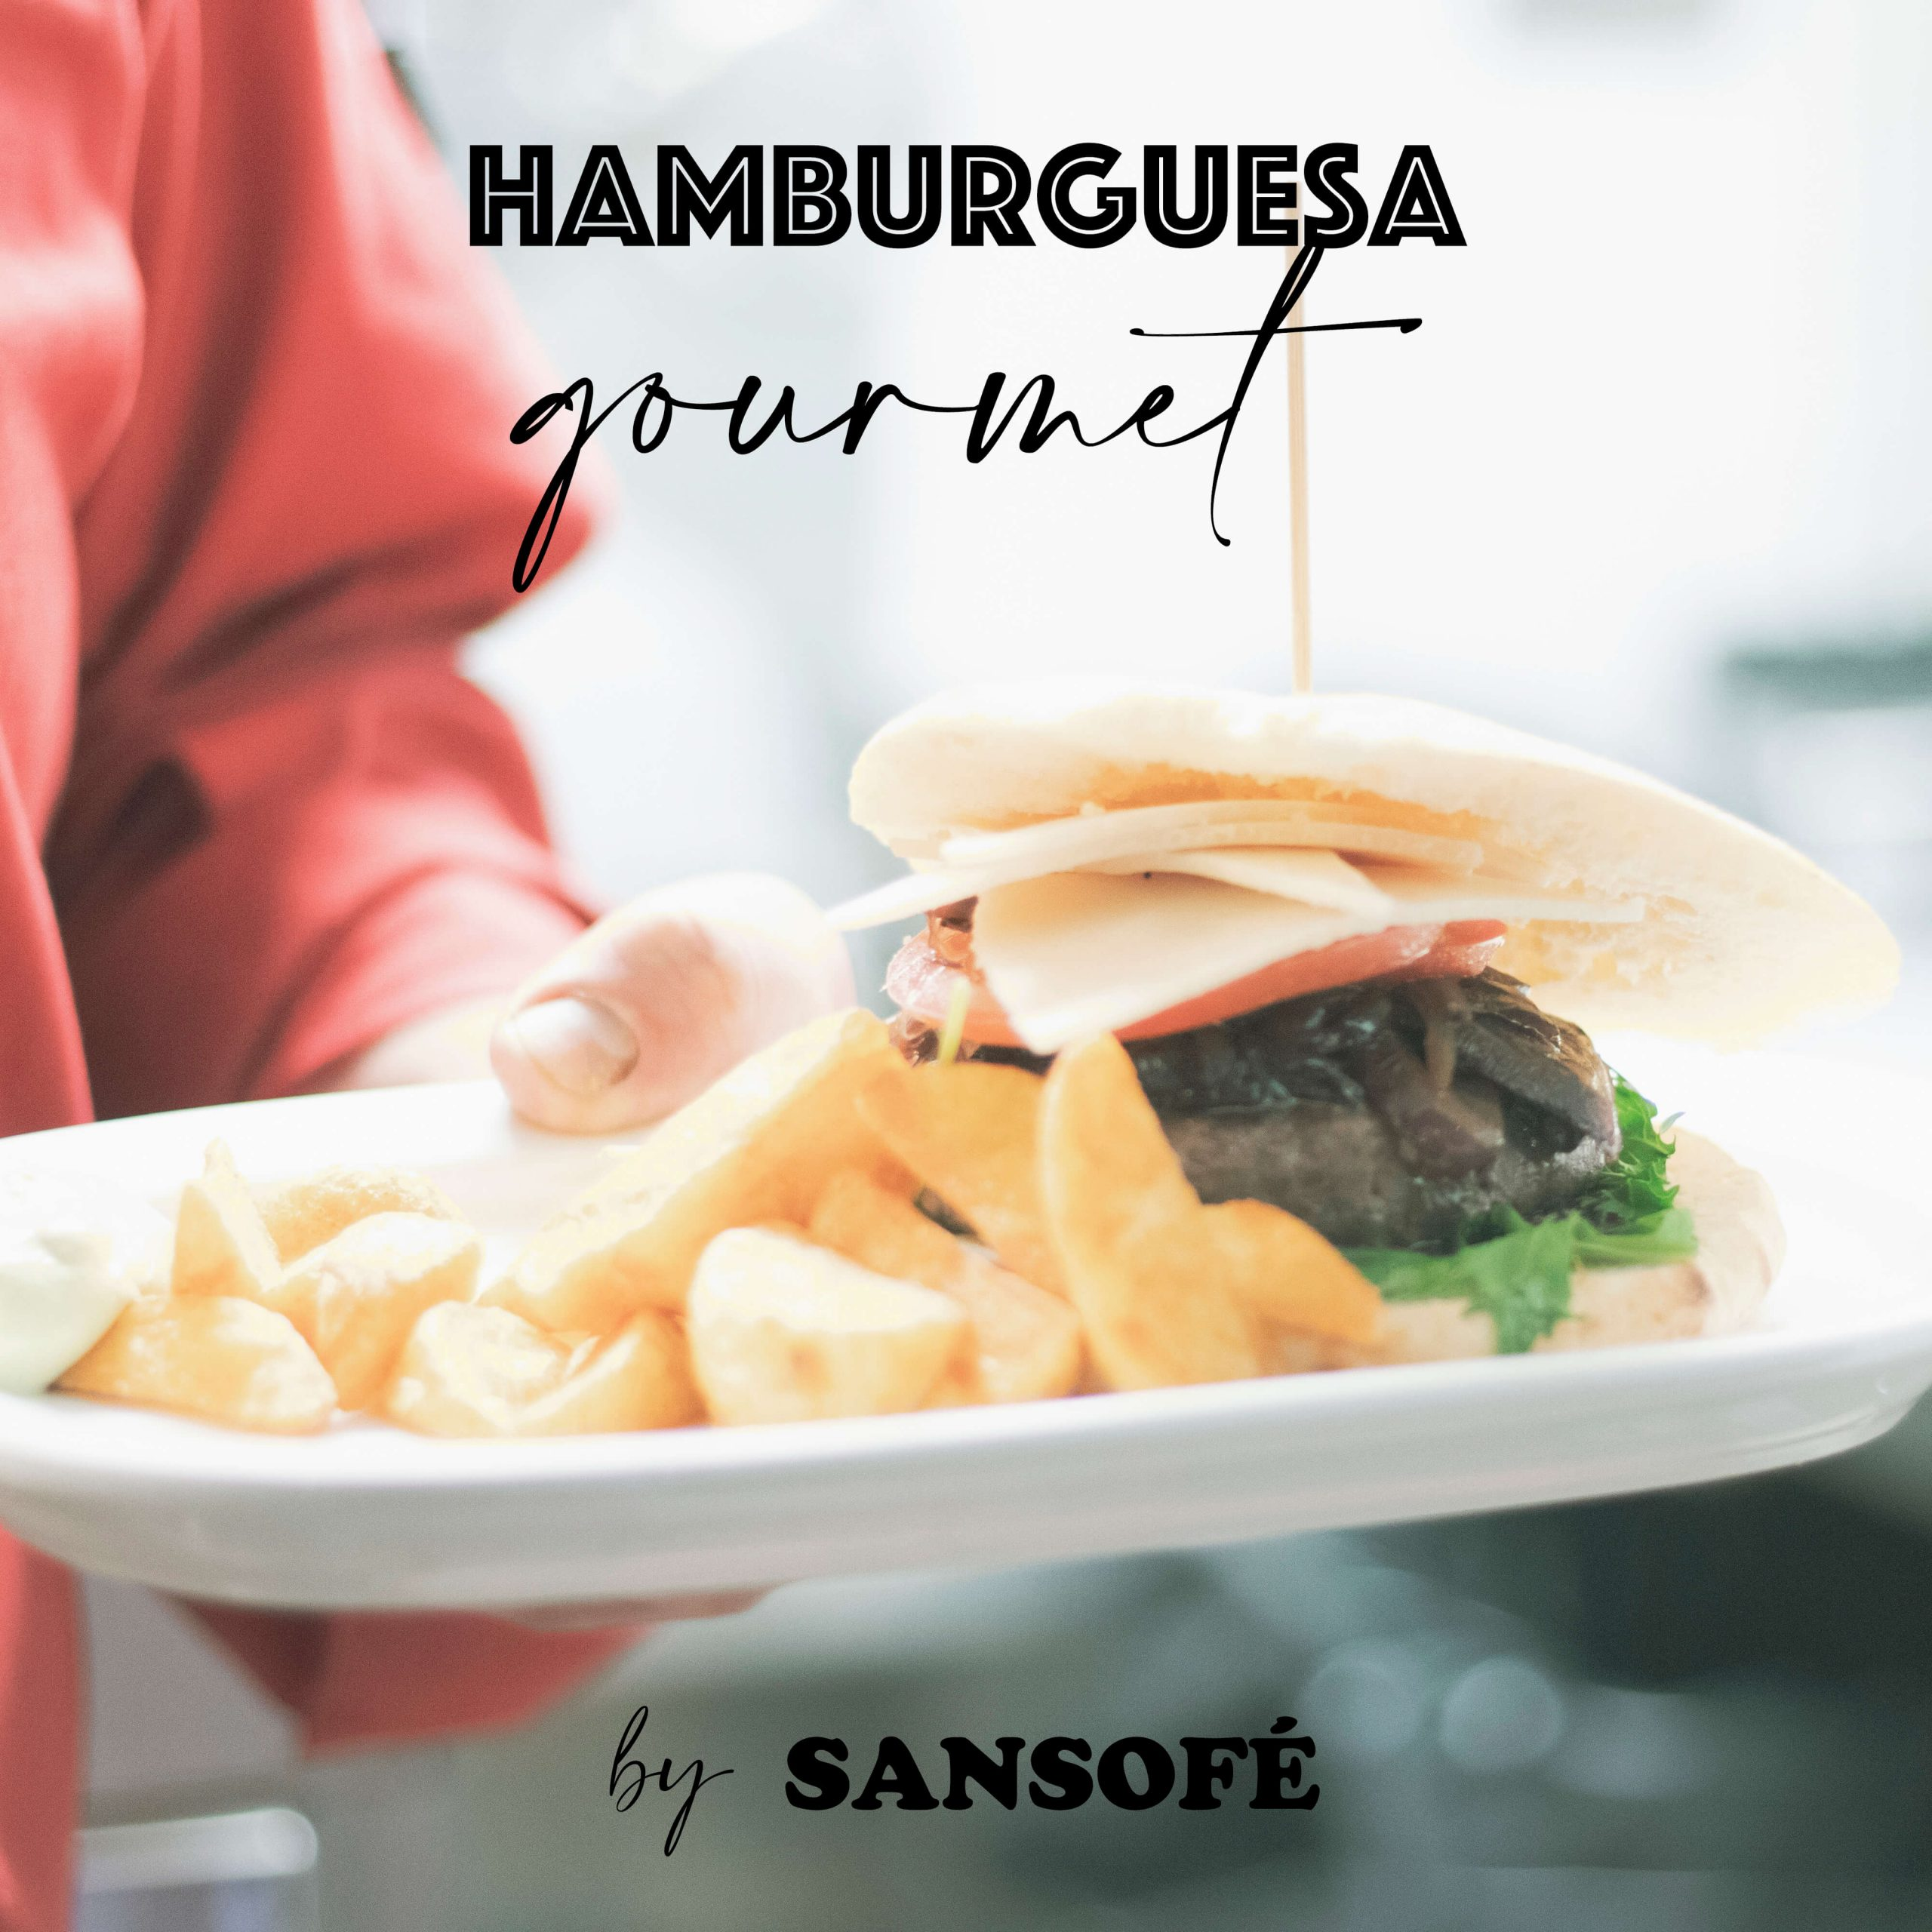 Concepto de Hamburguesa Gourmet por Tasca Sansofé